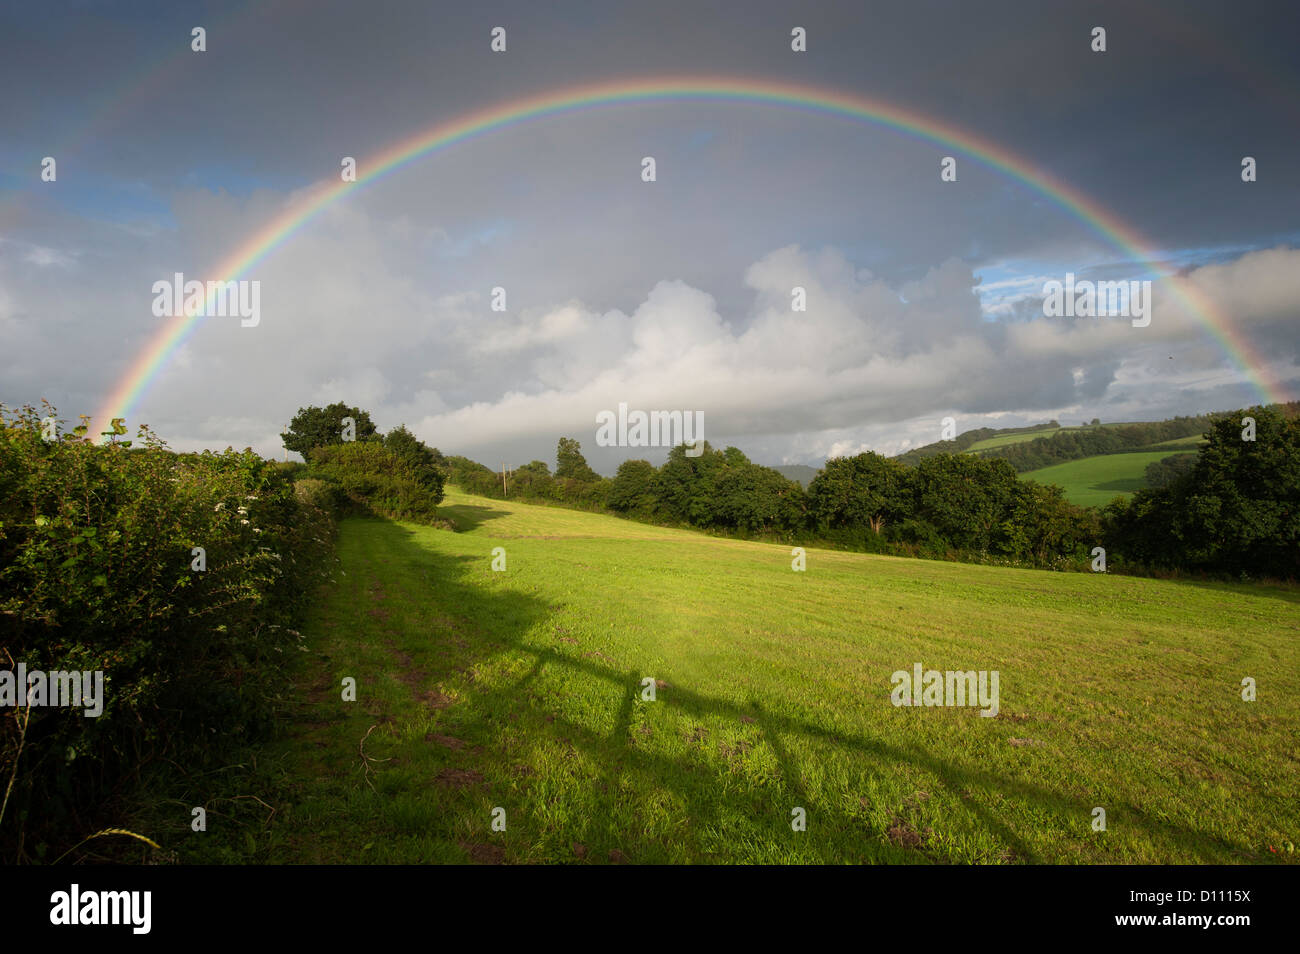 Rainbow over farmland in North Cornwall, UK - Stock Image